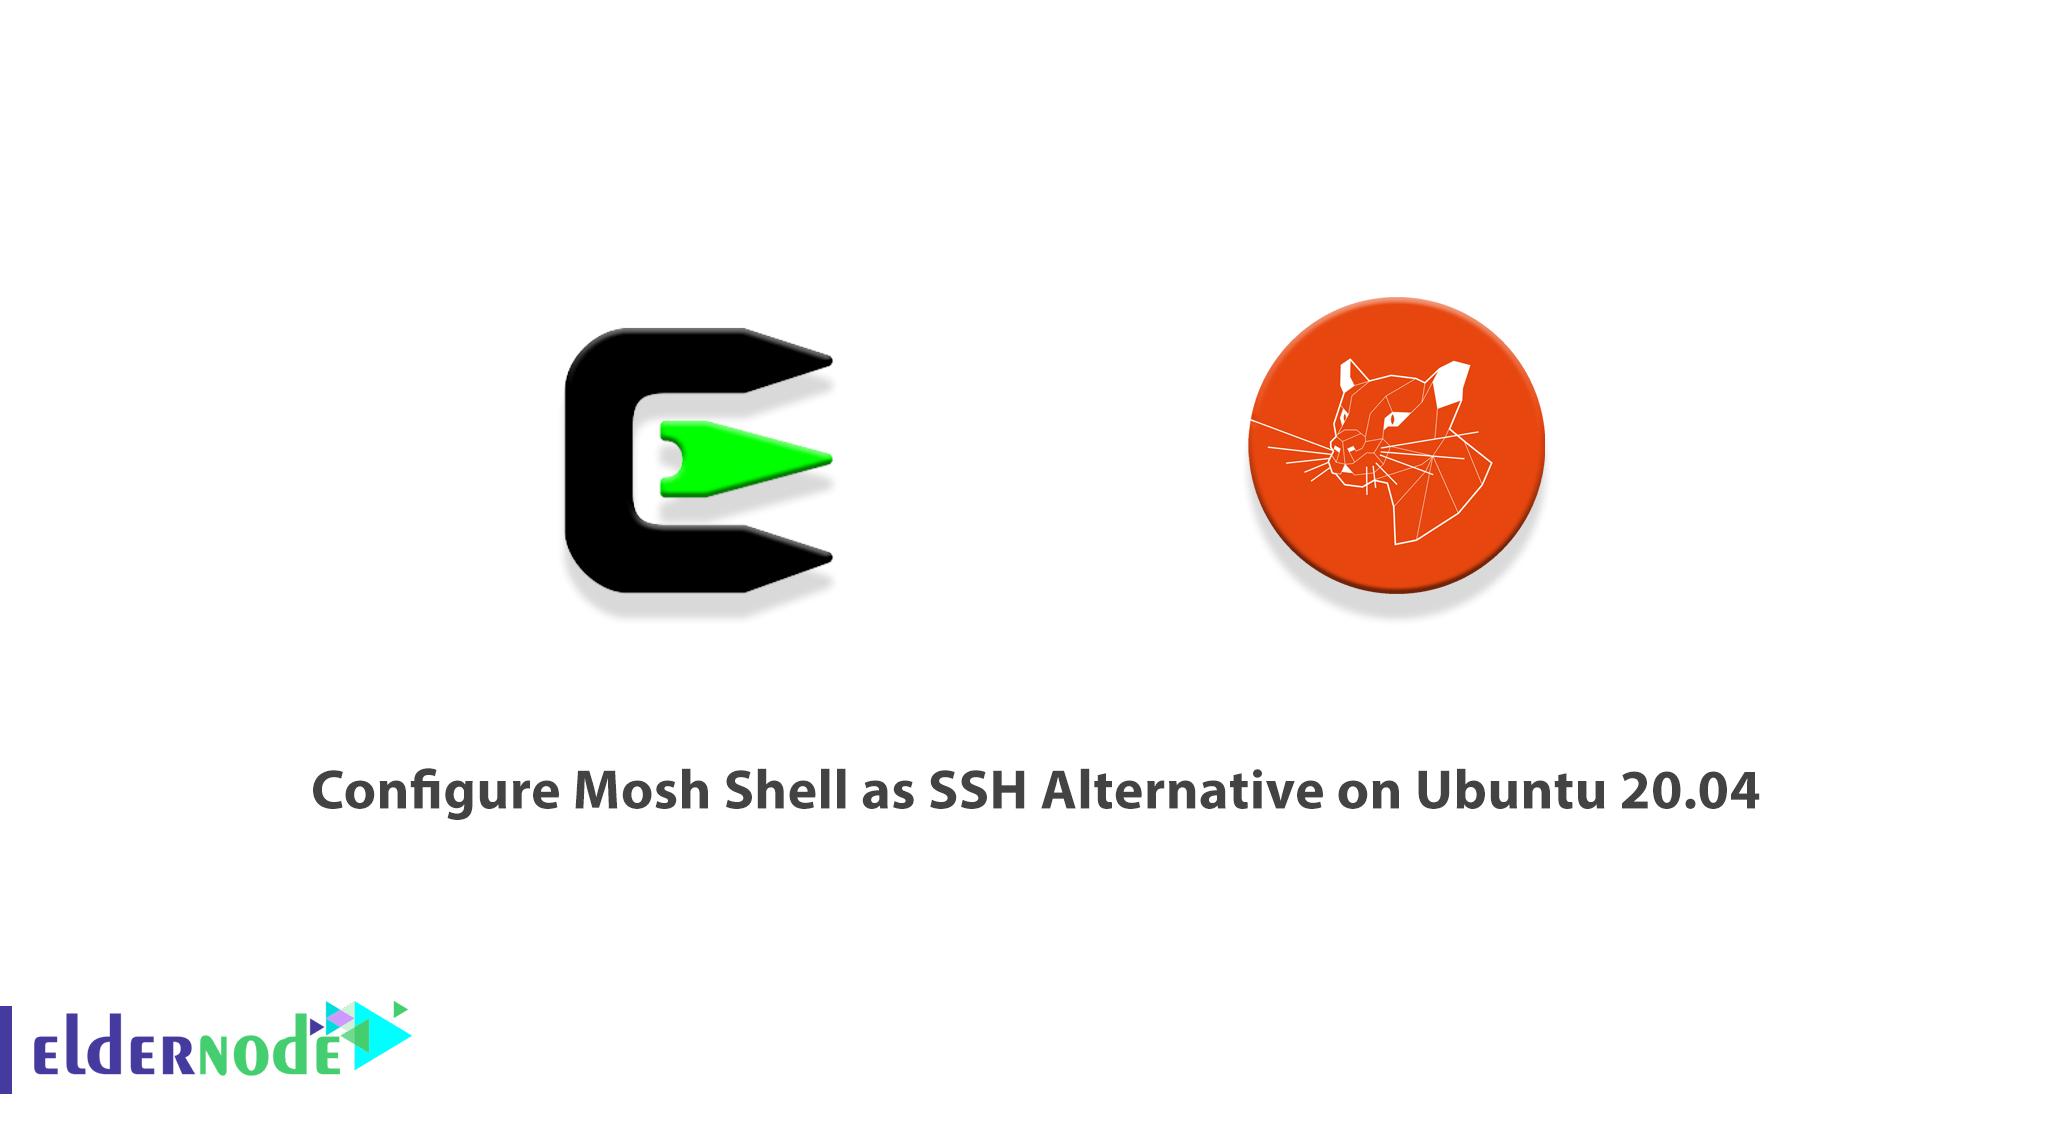 Configure Mosh Shell as SSH Alternative on Ubuntu 20.04